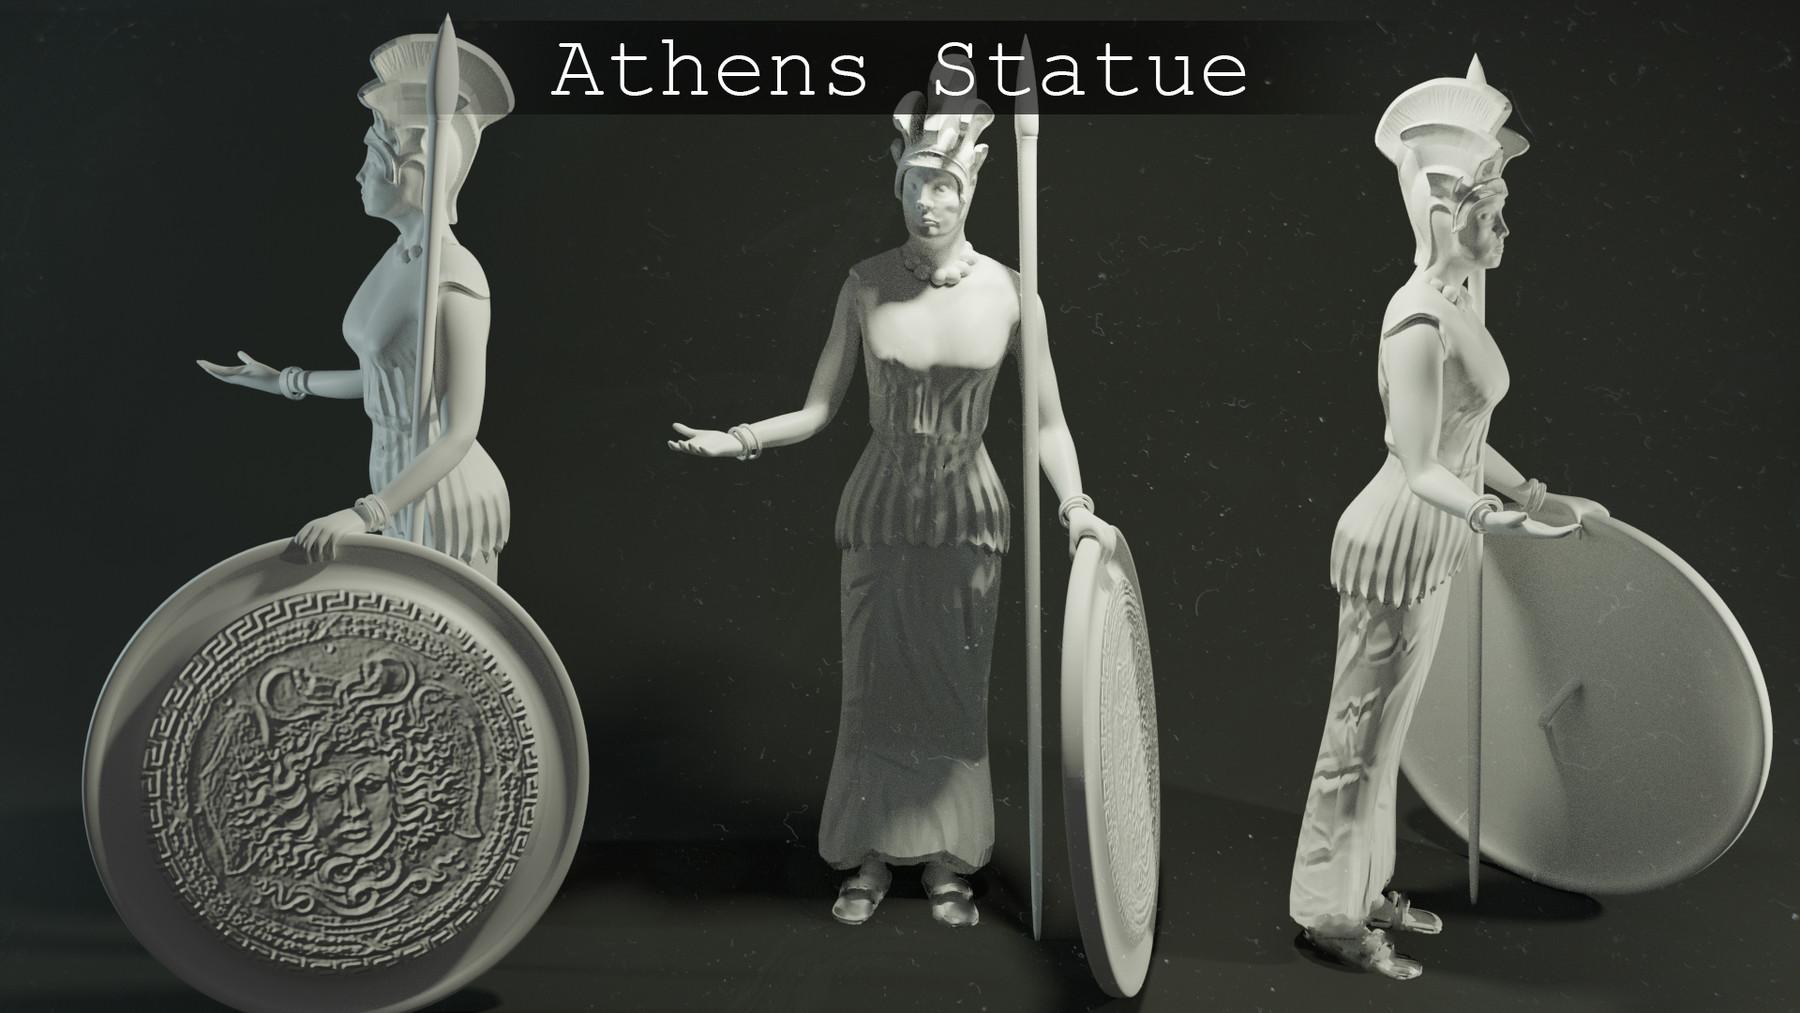 Athensthumb